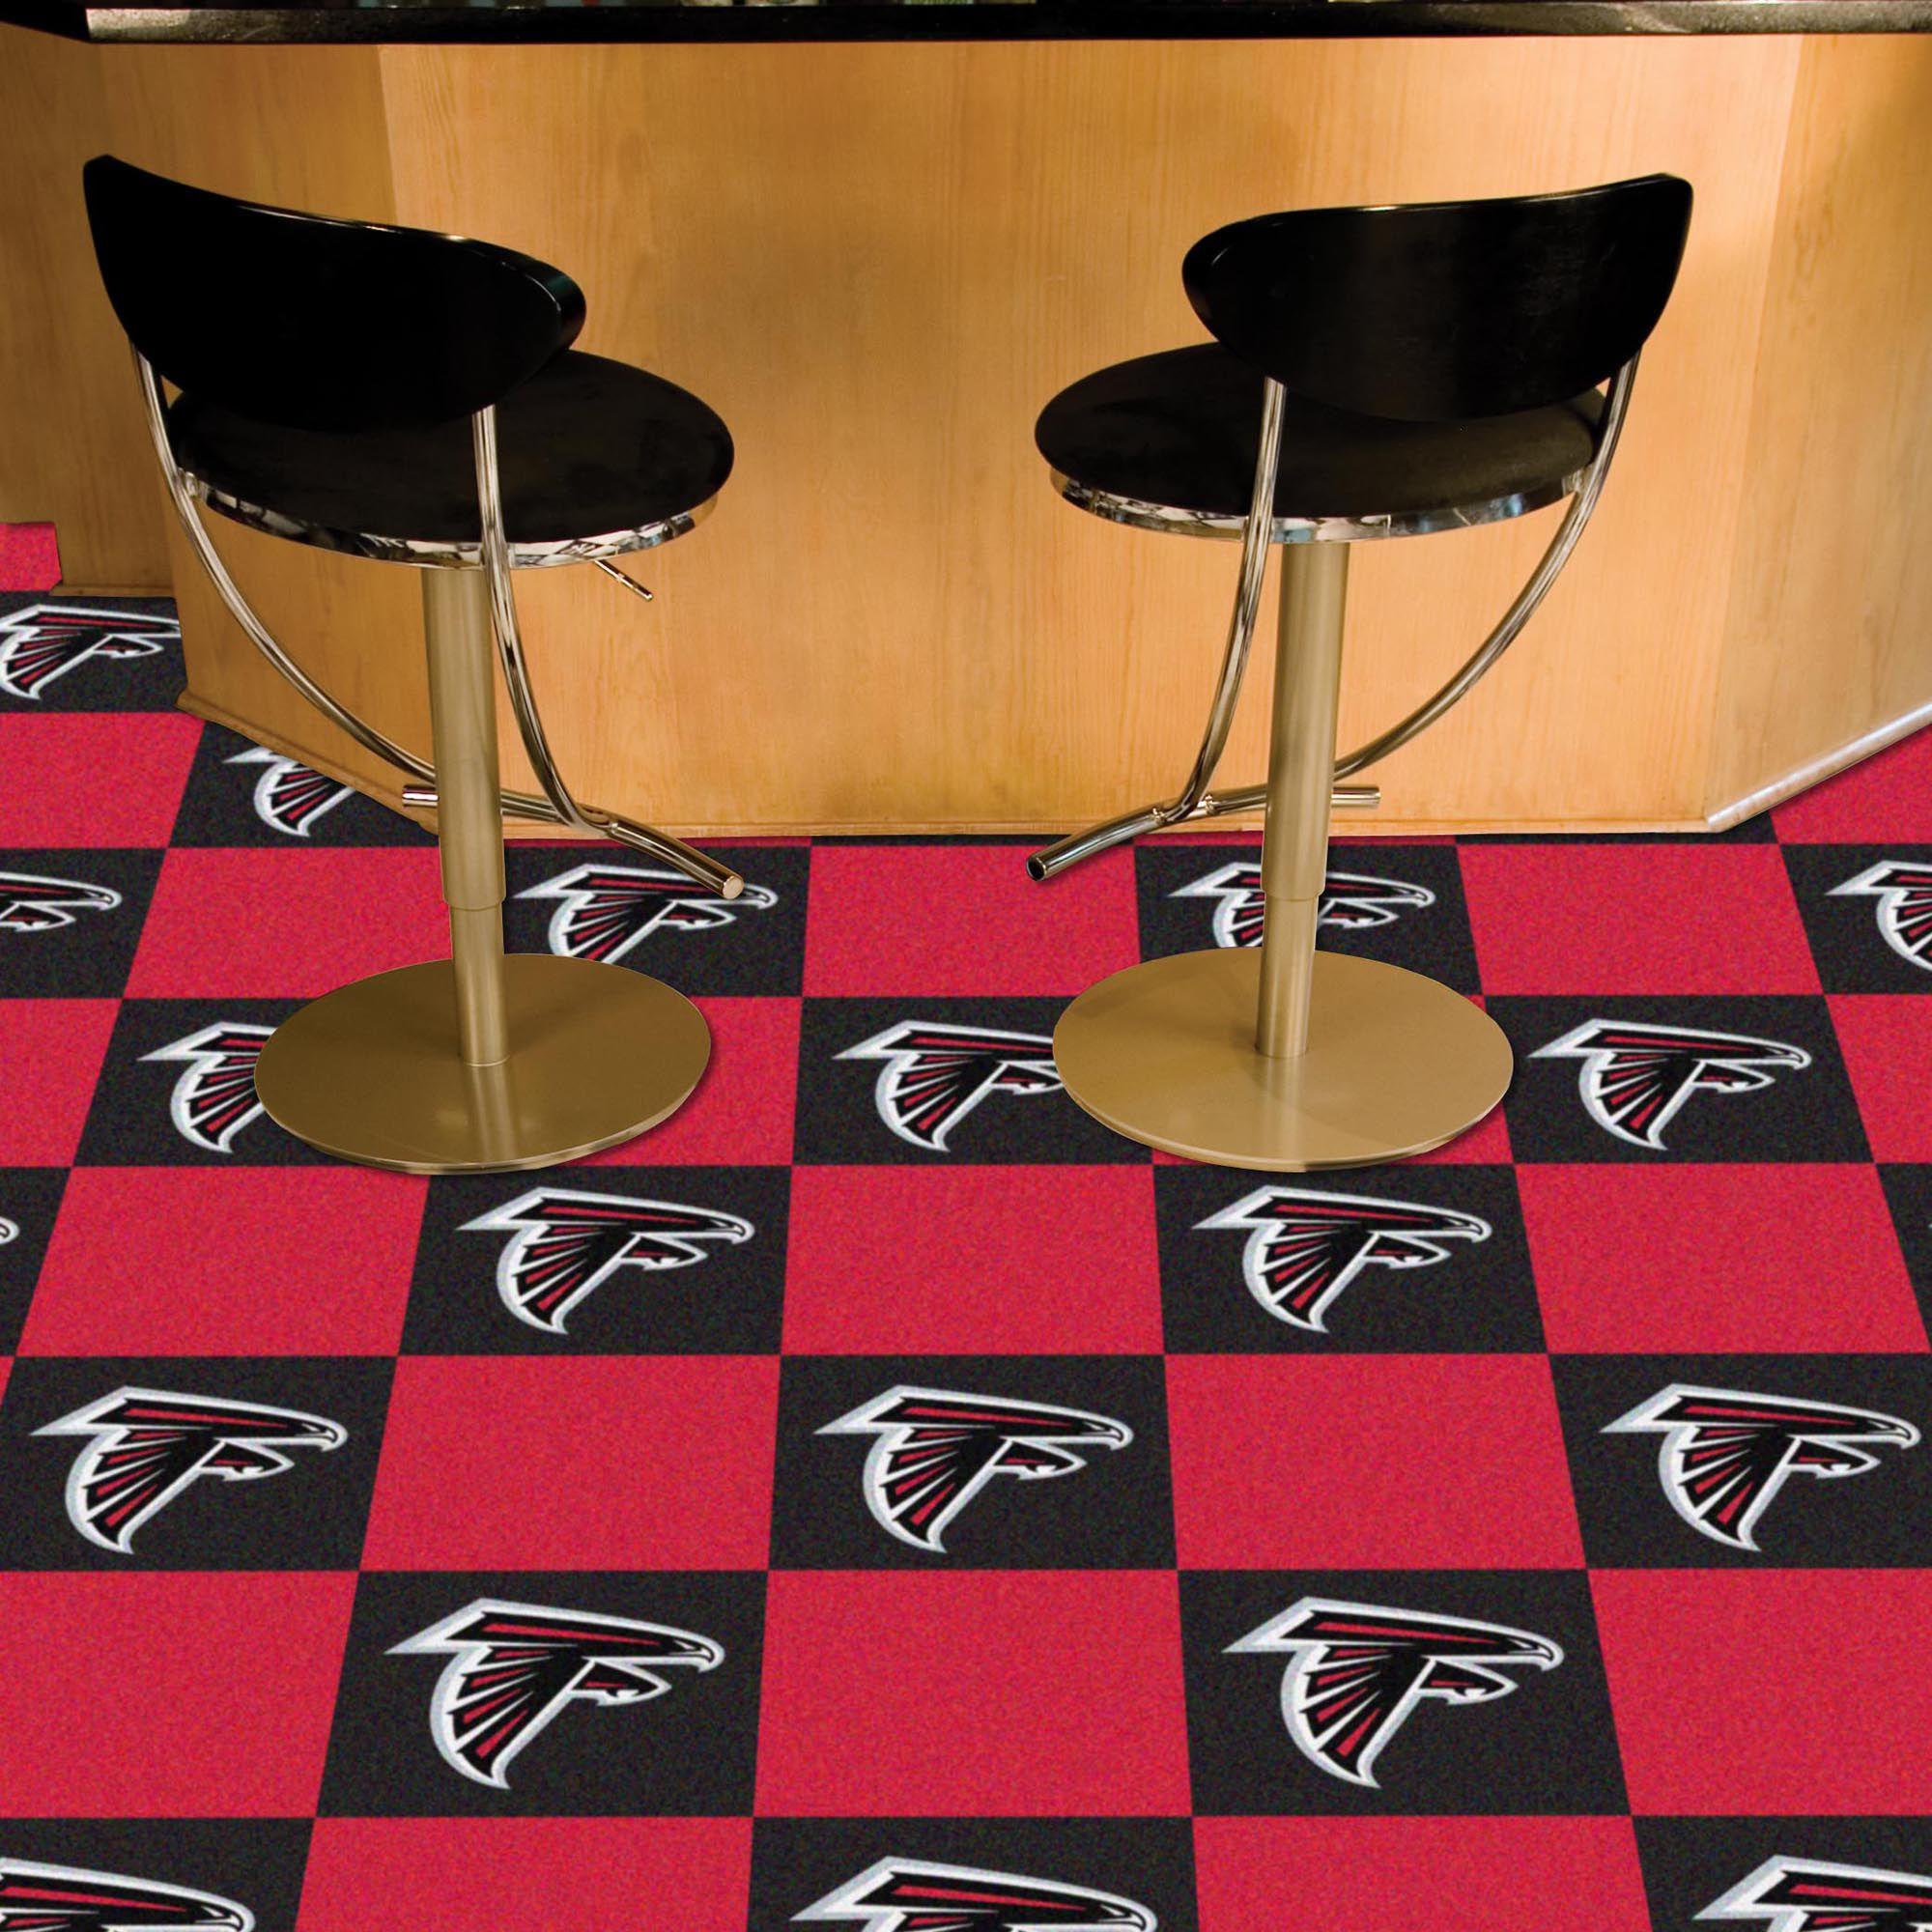 Delicieux FANMATS Atlanta Falcons Team Carpet Tiles